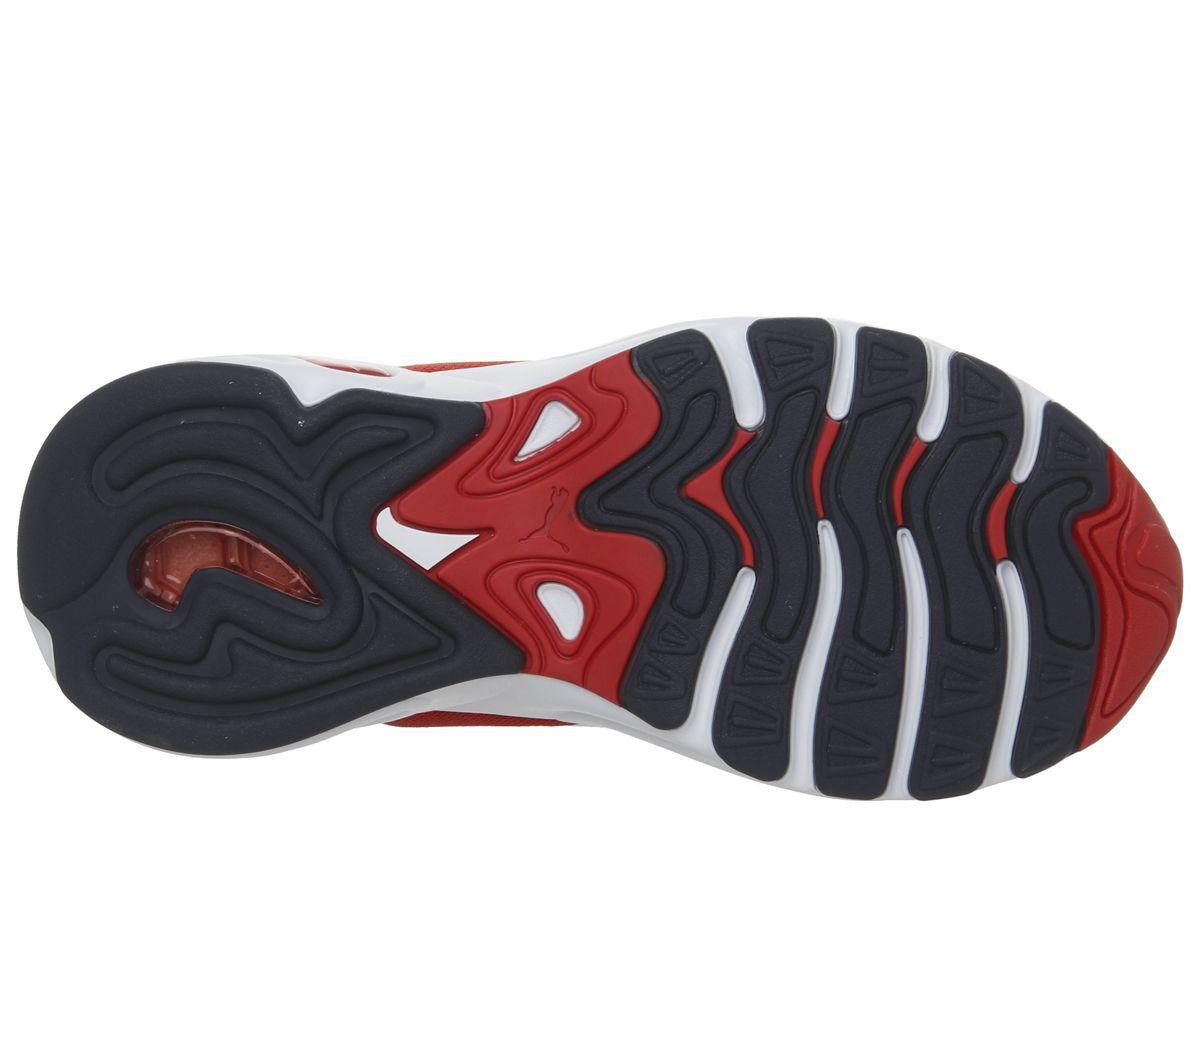 Homme-Puma-Cell-Viper-Baskets-PUMA-blanc-Risque-Eleve-Rouge-Baskets miniature 11